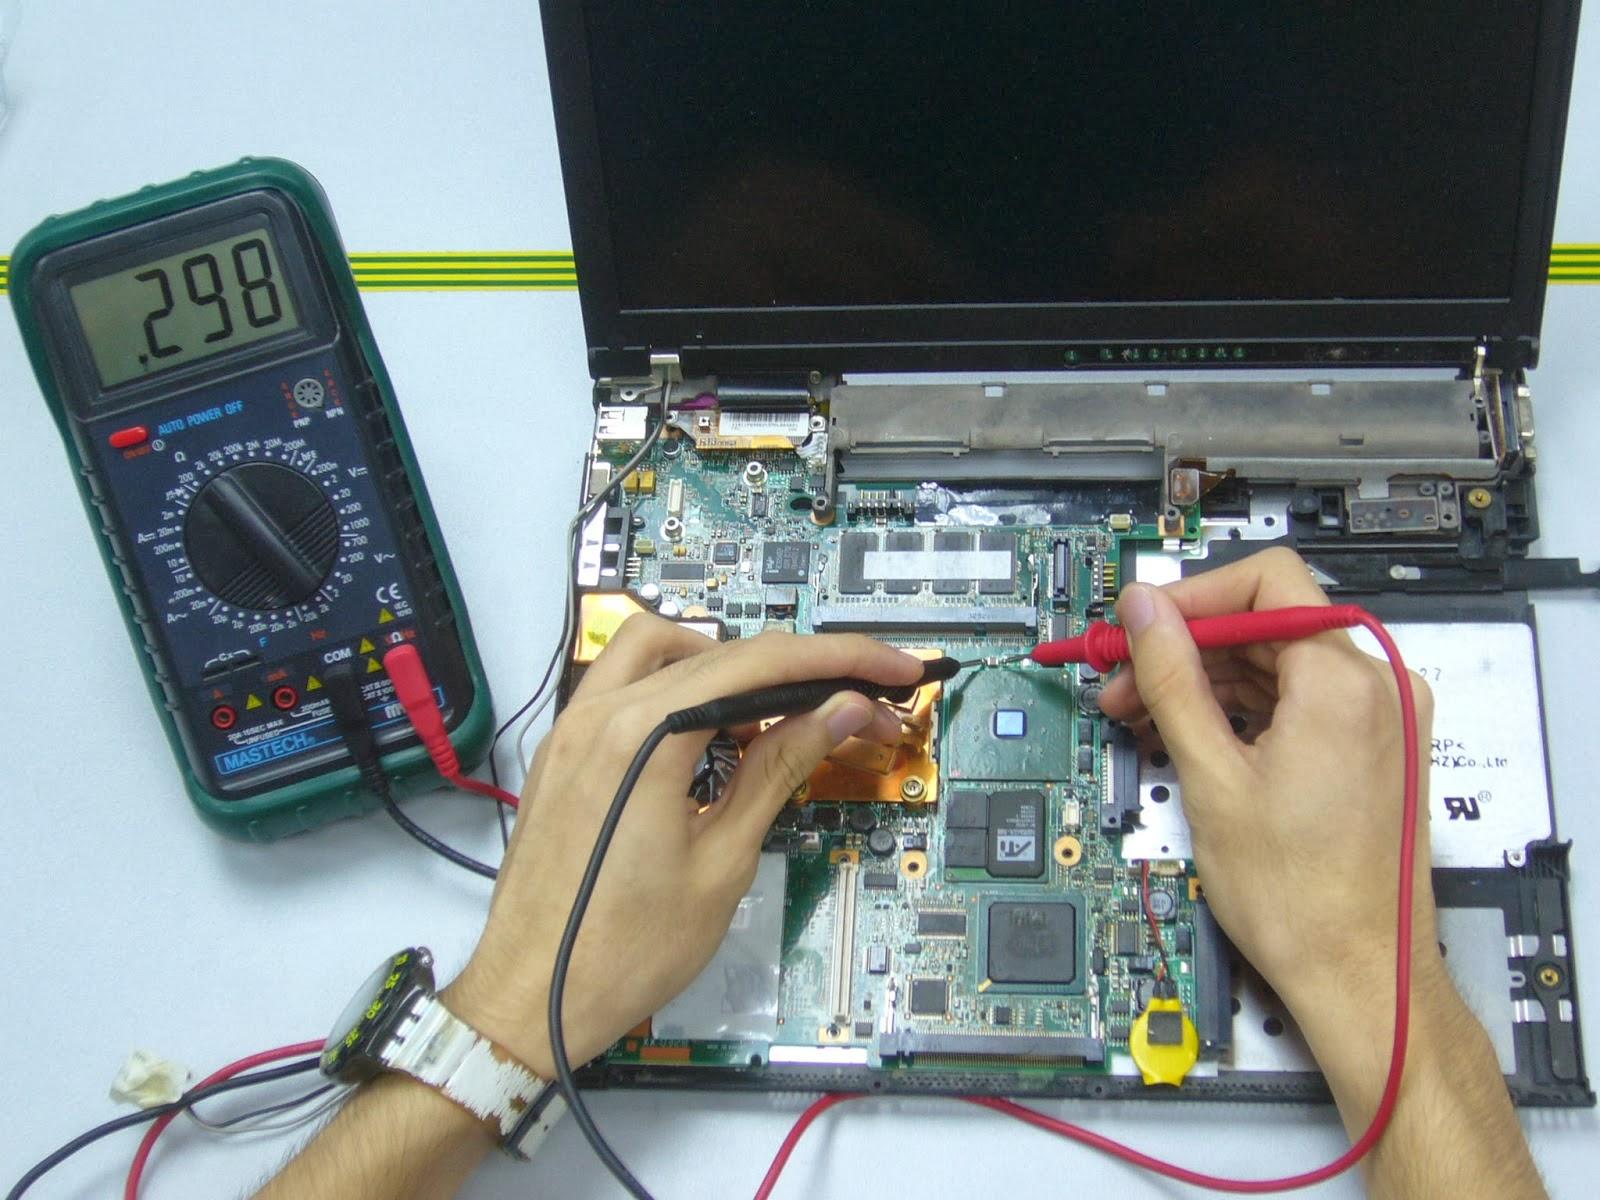 Compaq Presario 730US Notebook Battery Controller/KBC 64x